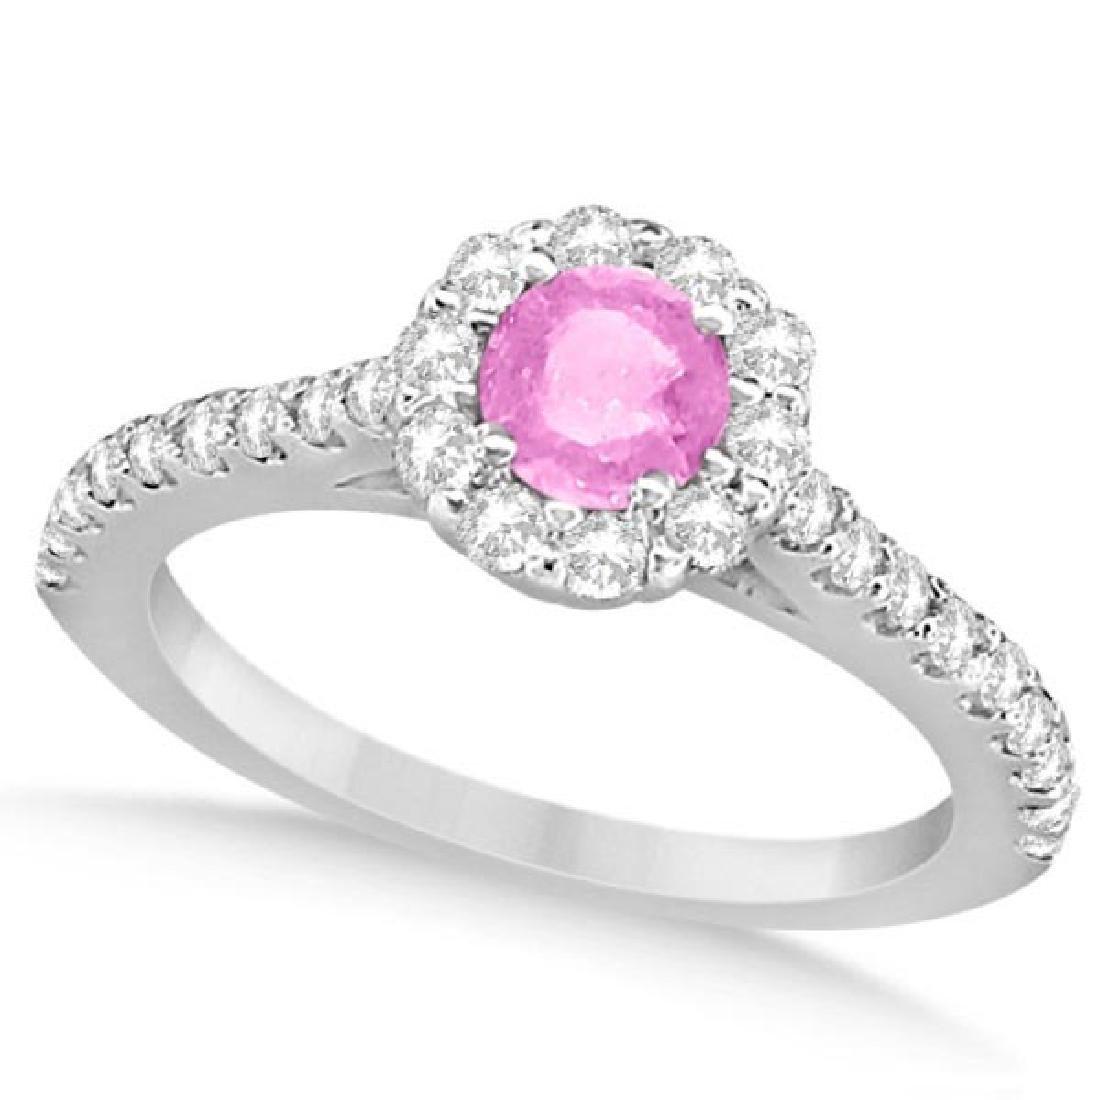 Enhanced Pink Diamond Engagement Ring Pave Halo 14k Whi